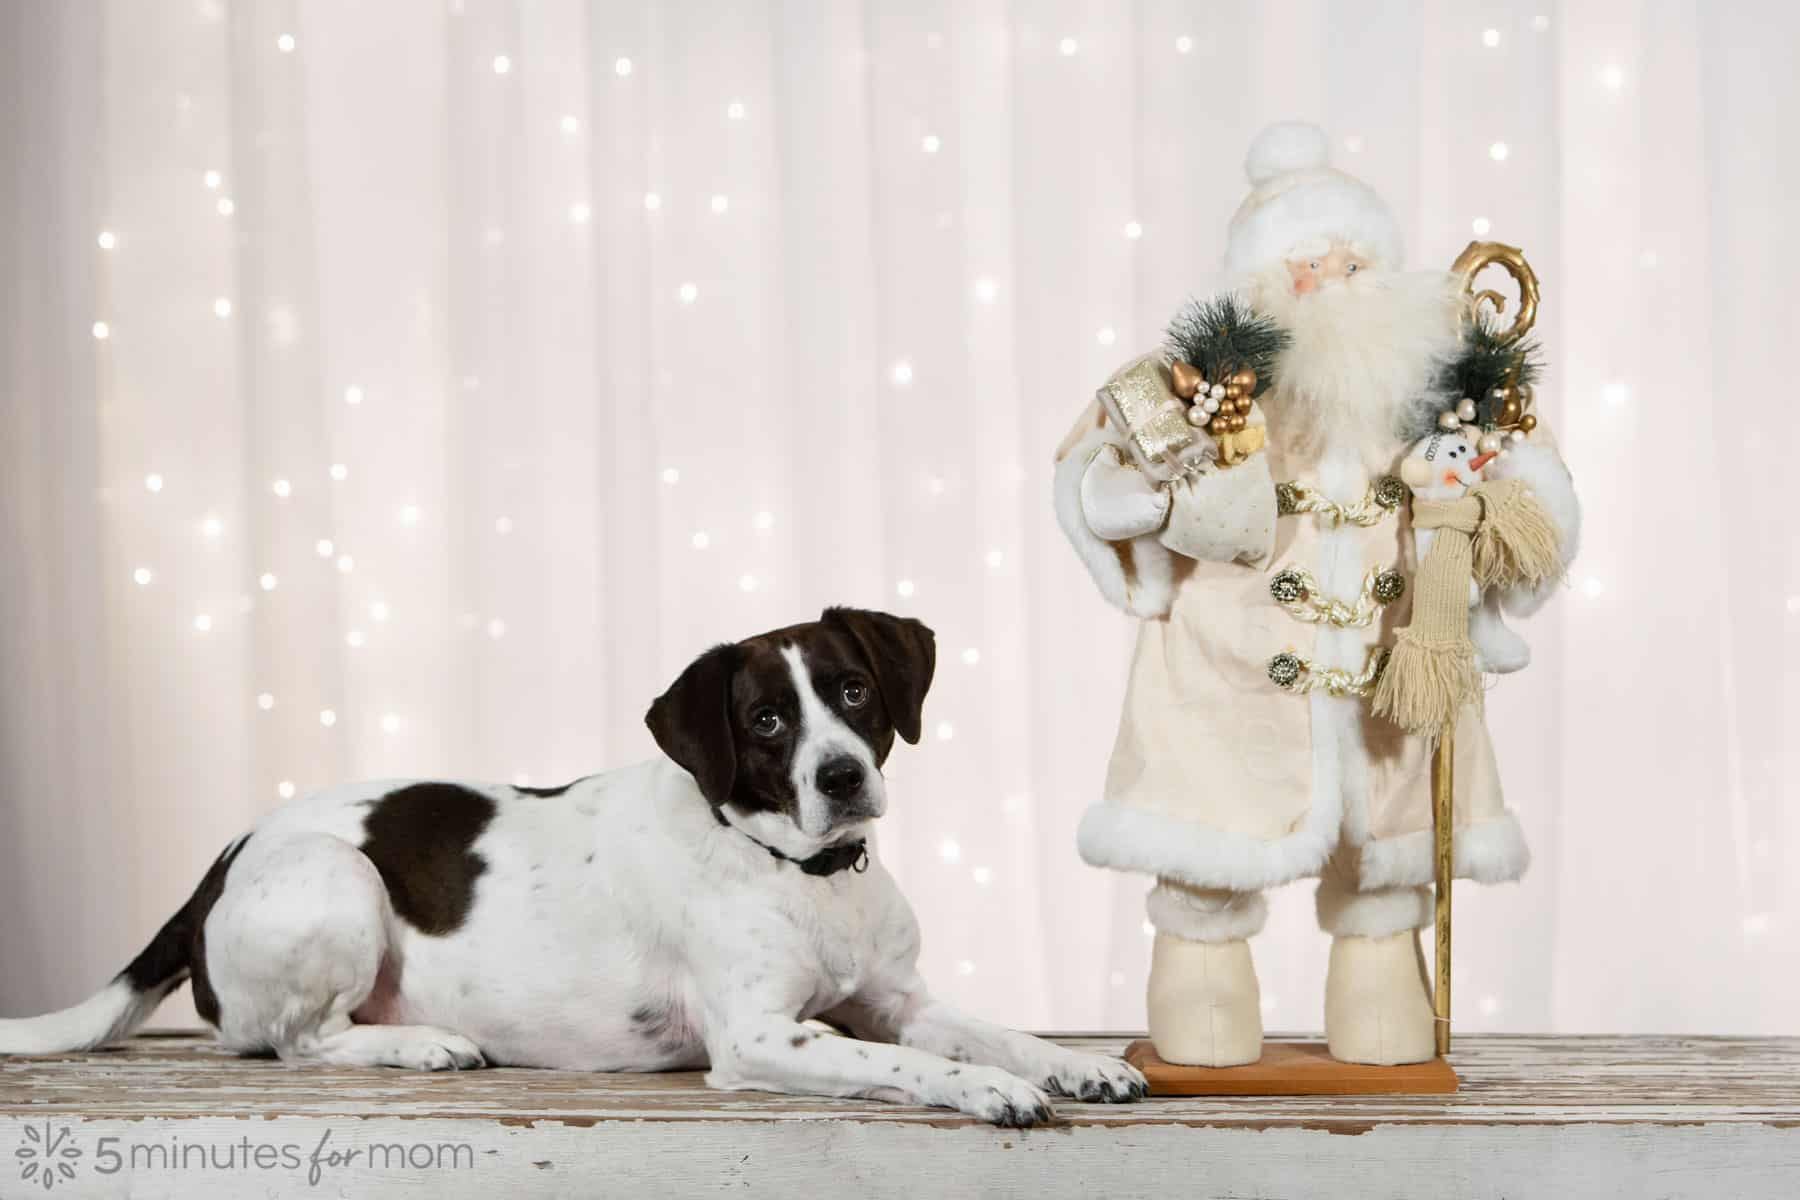 Merry Christmas - AJ with Santa Claus Statue